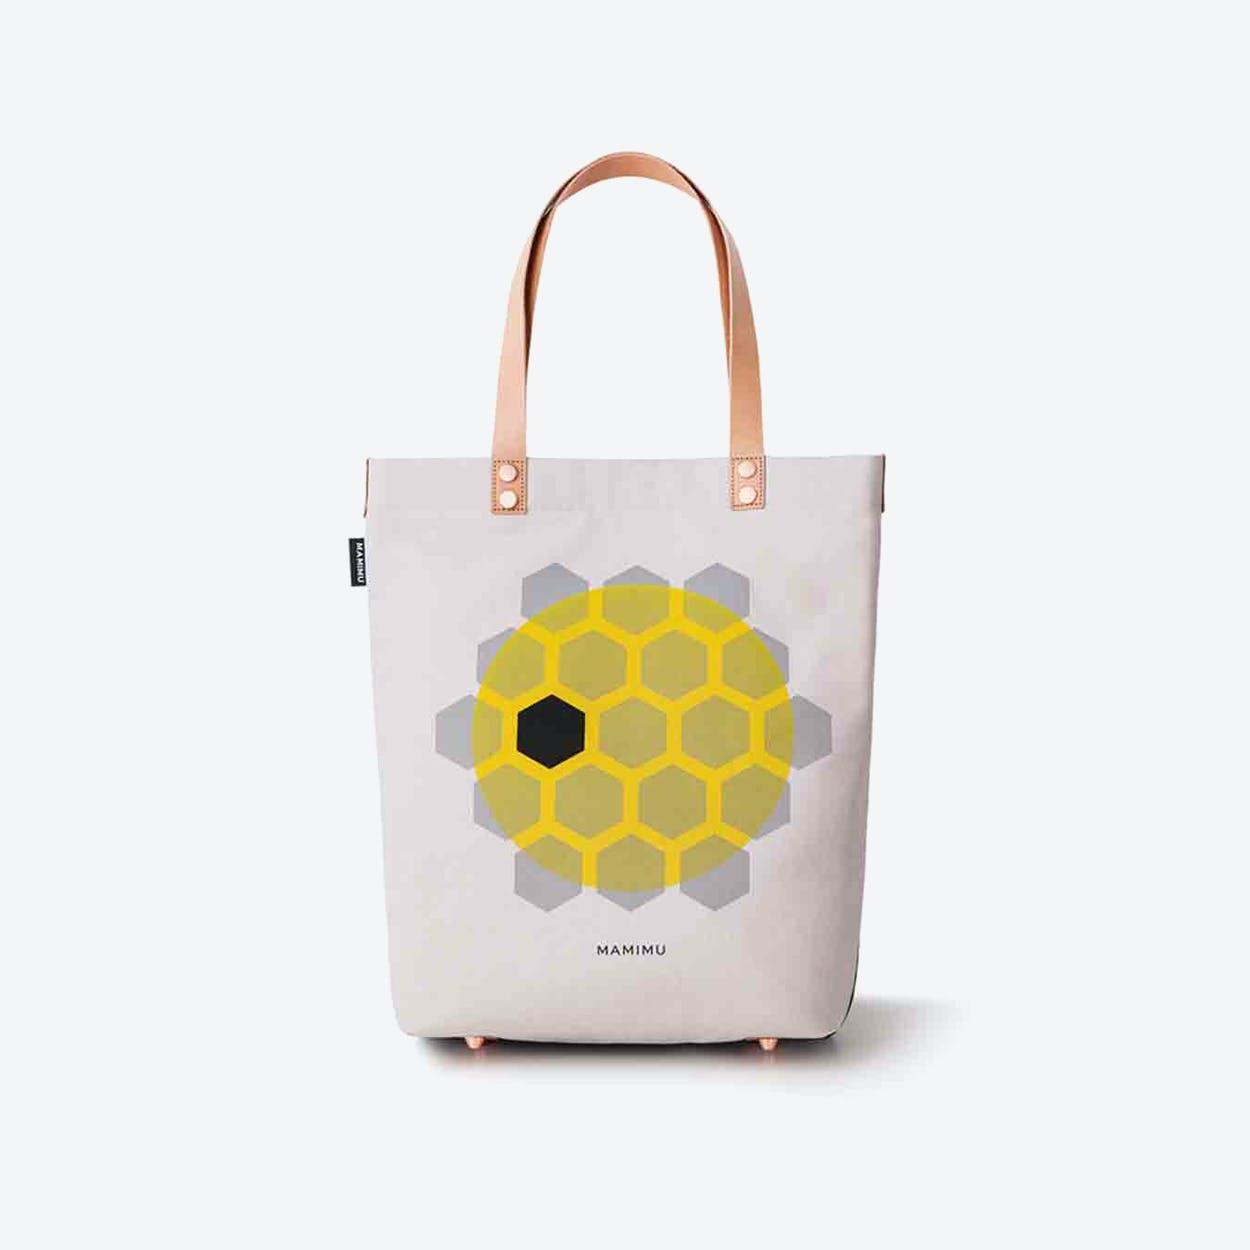 City Tote Laptop Bag: New York